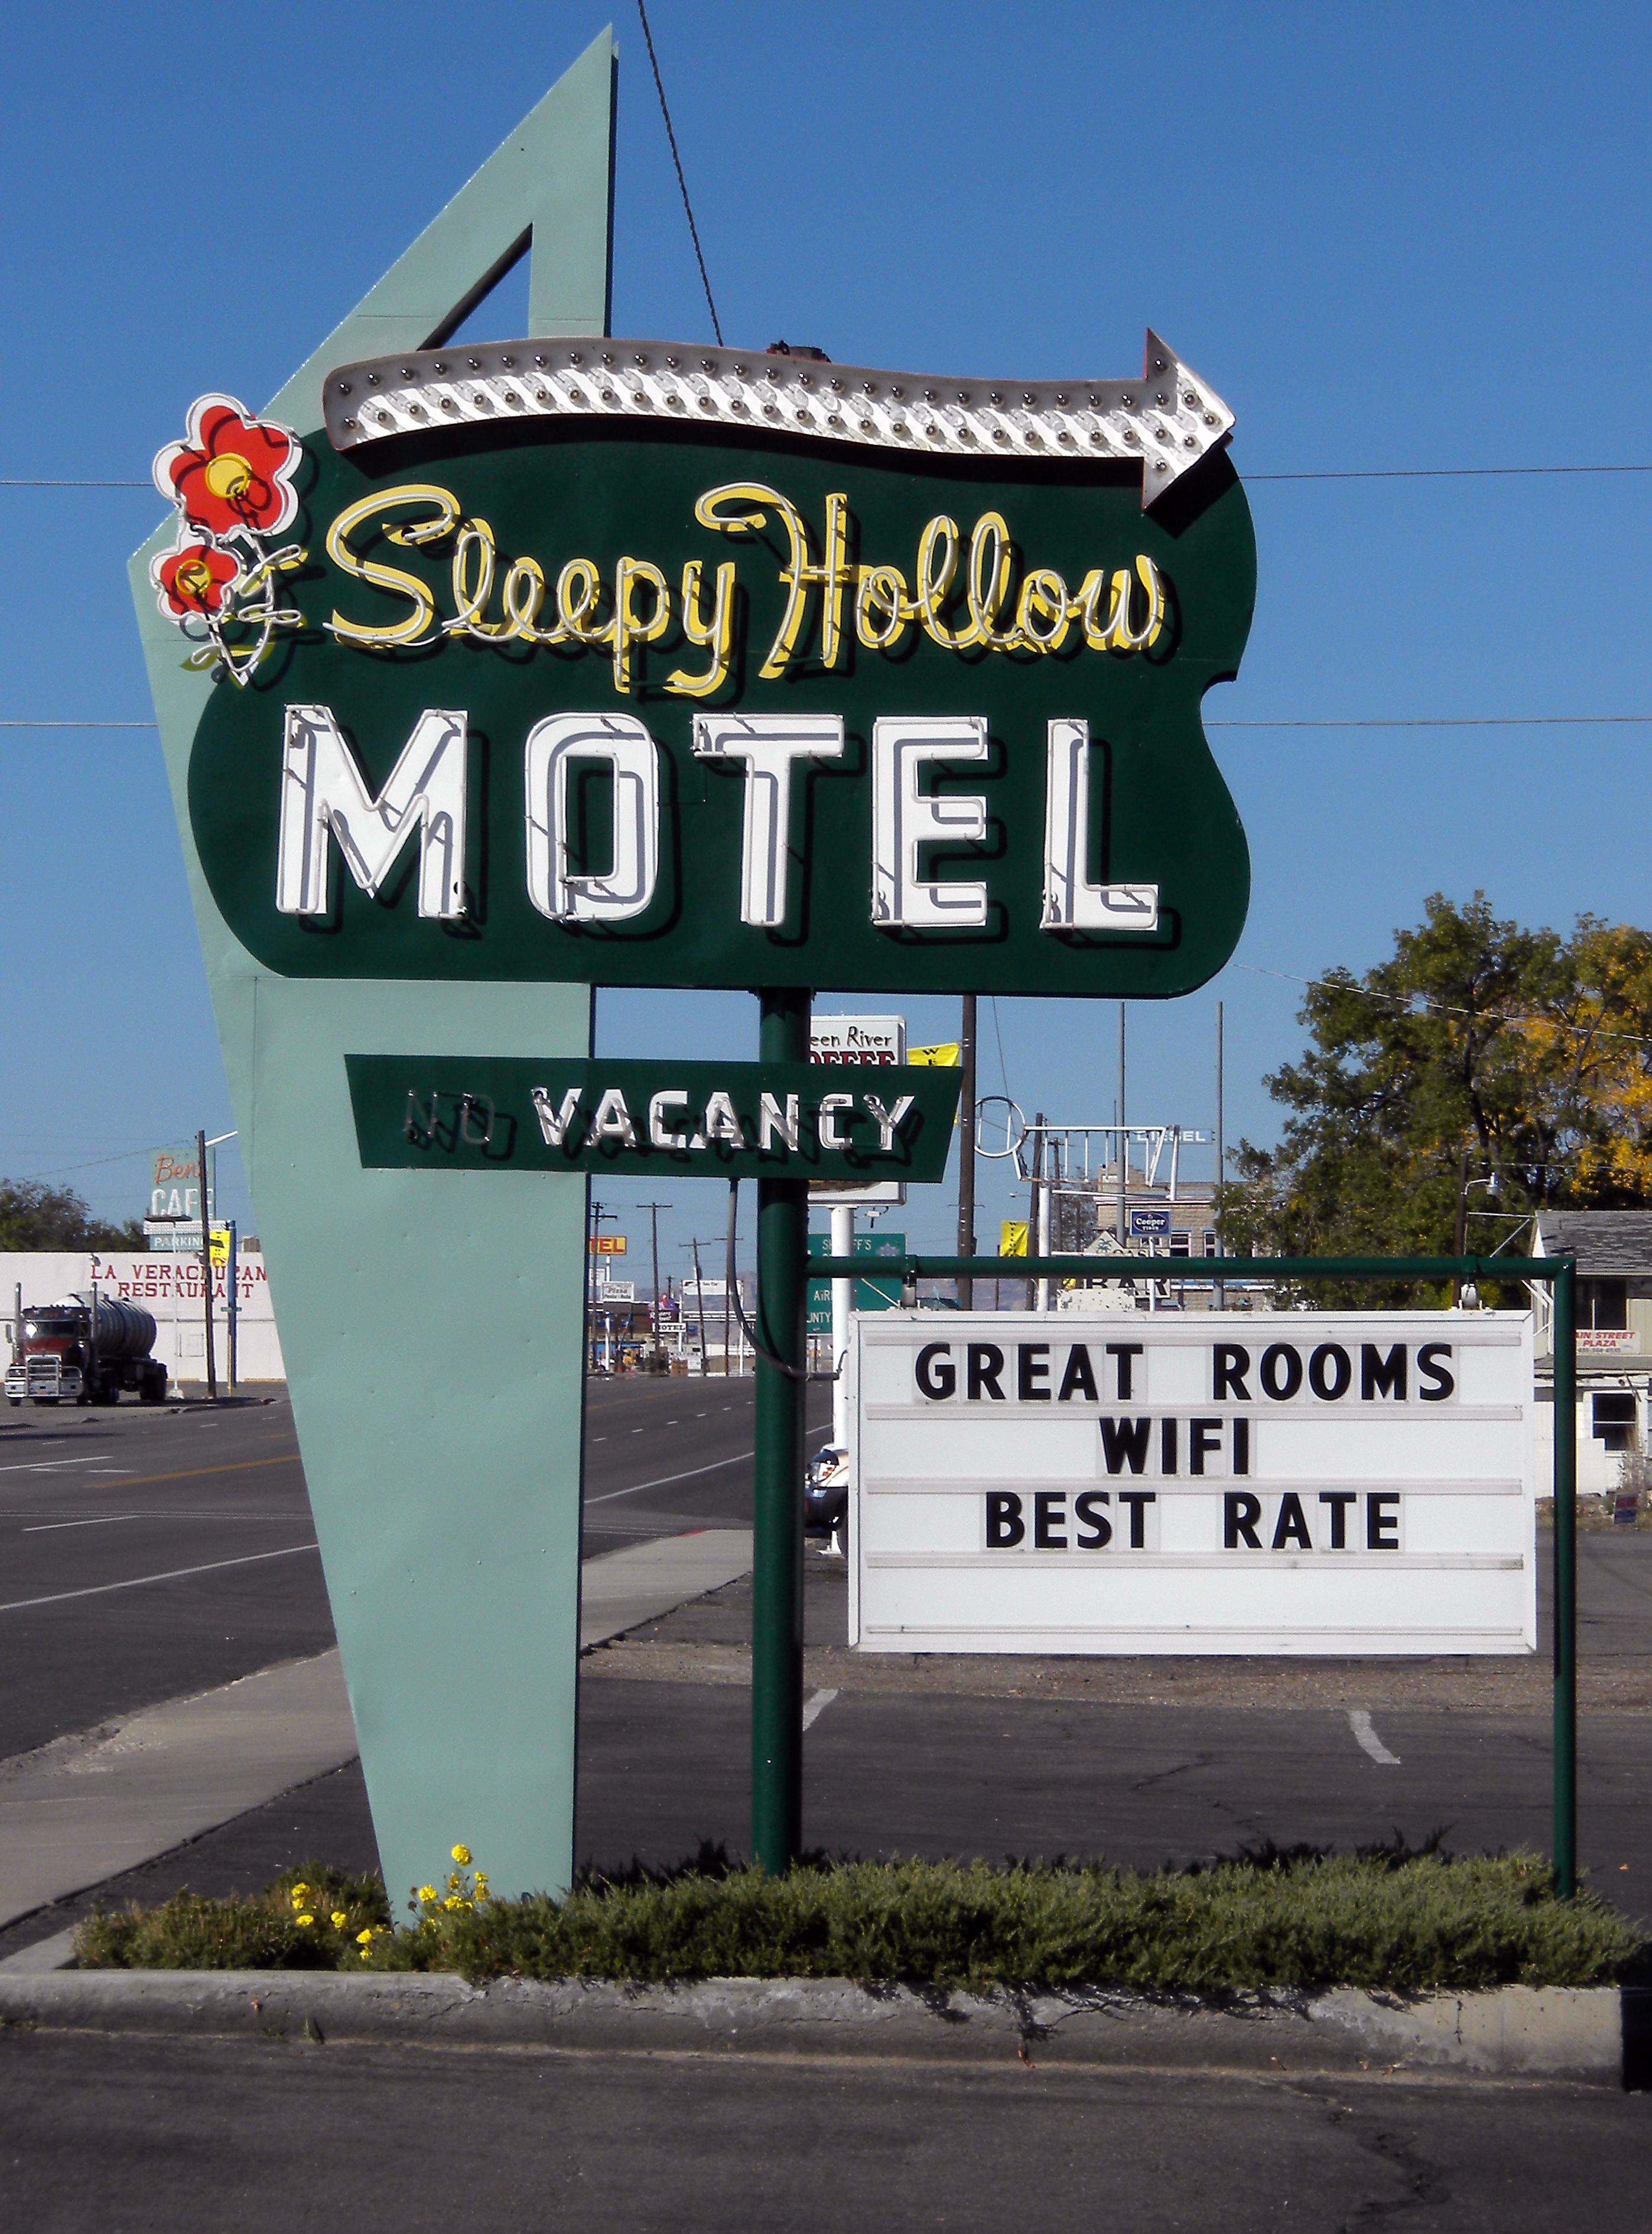 Sleepy Hollow Motel - 94 East Main Street, Green River, Utah U.S.A. - May 13, 2016